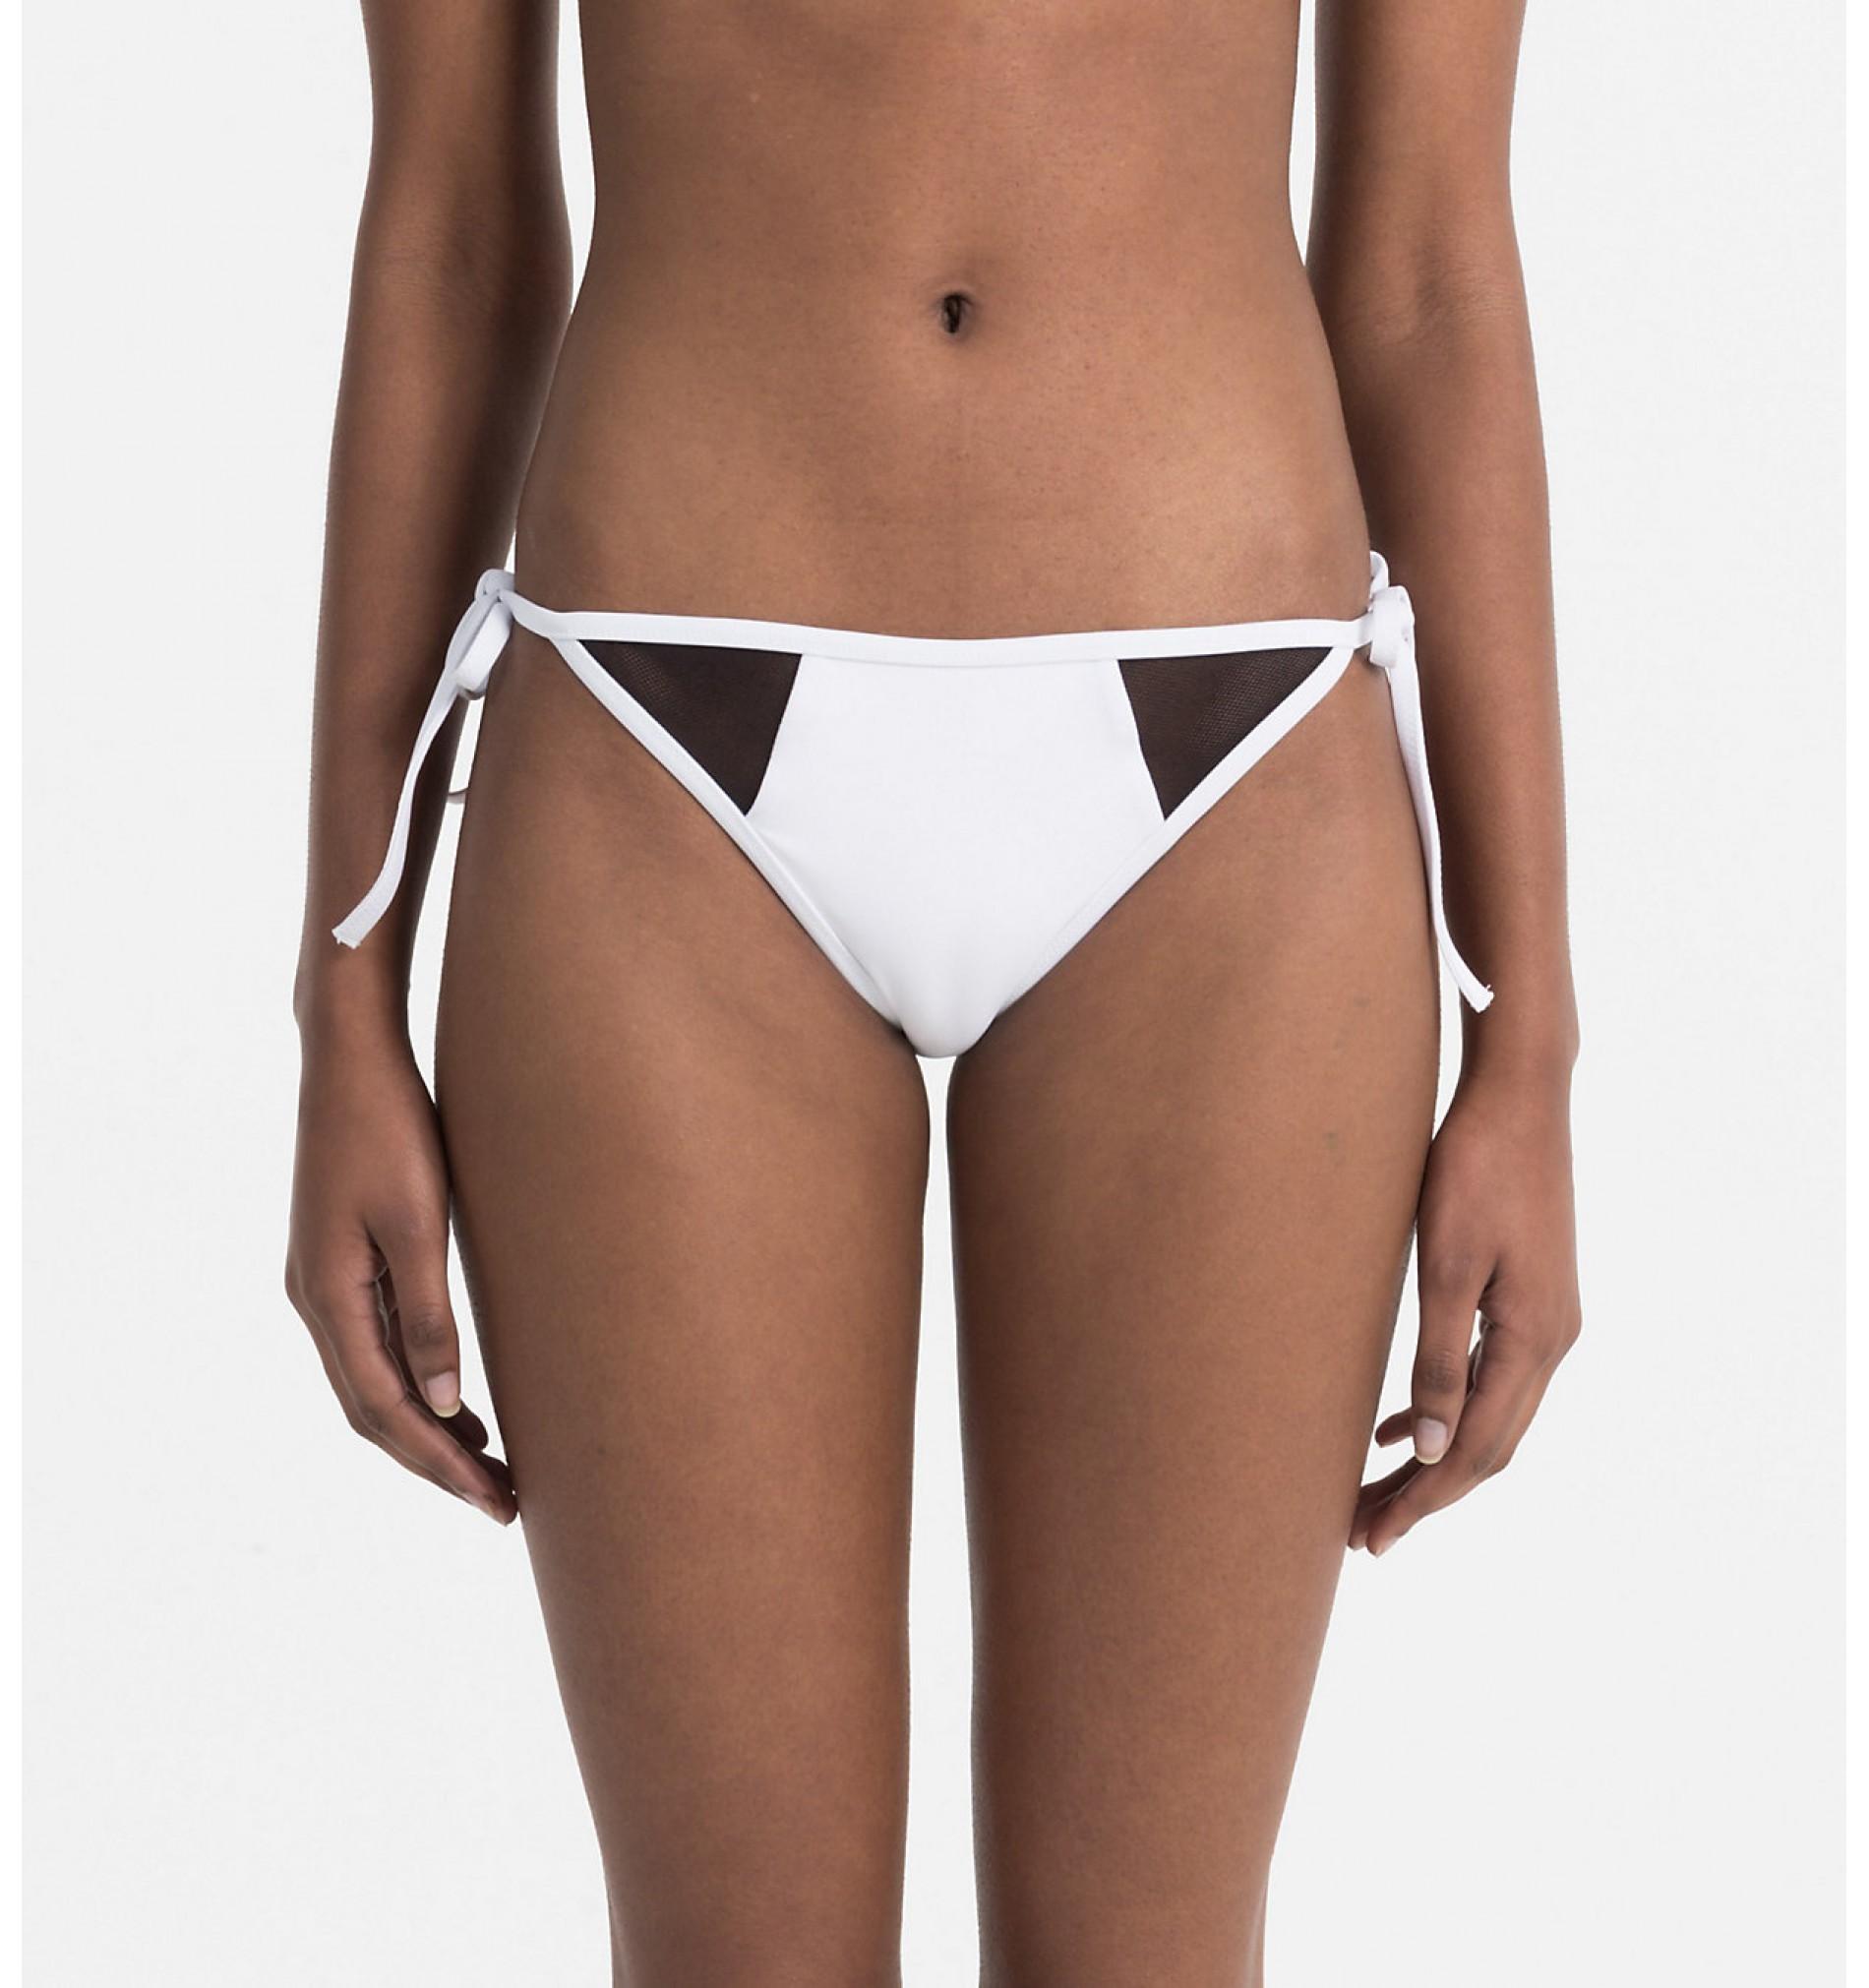 dámske plavky - BIKINI 'INTENSE POWER' biele  100